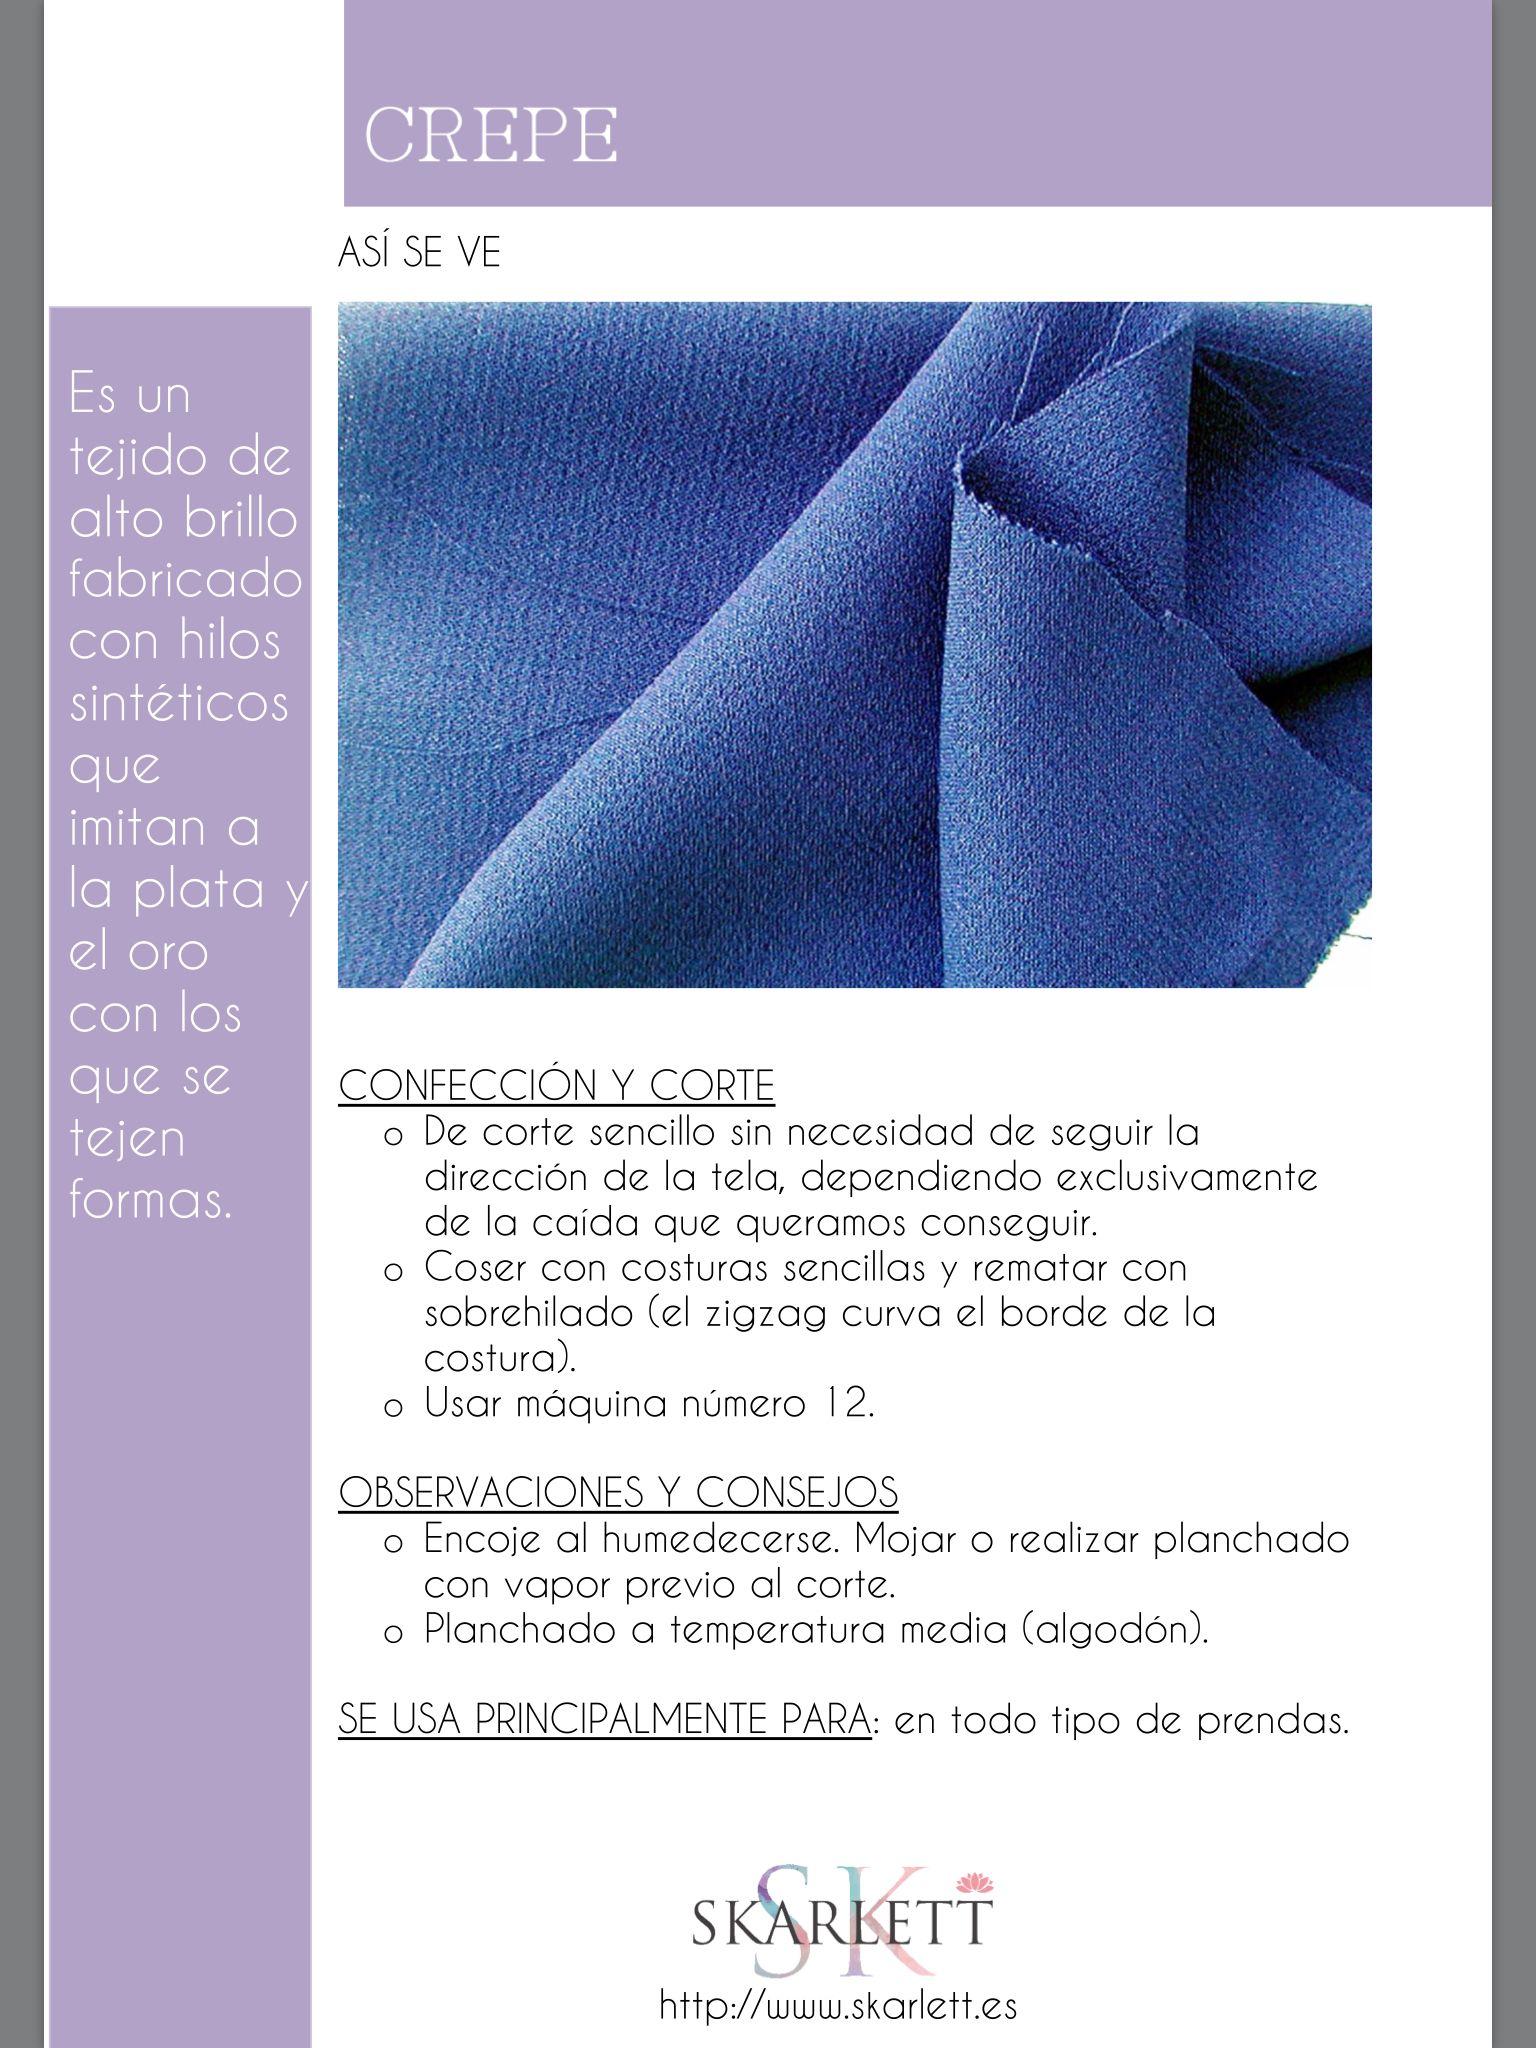 El dossier de las telas Skarlett | Patrones de costura | Pinterest ...